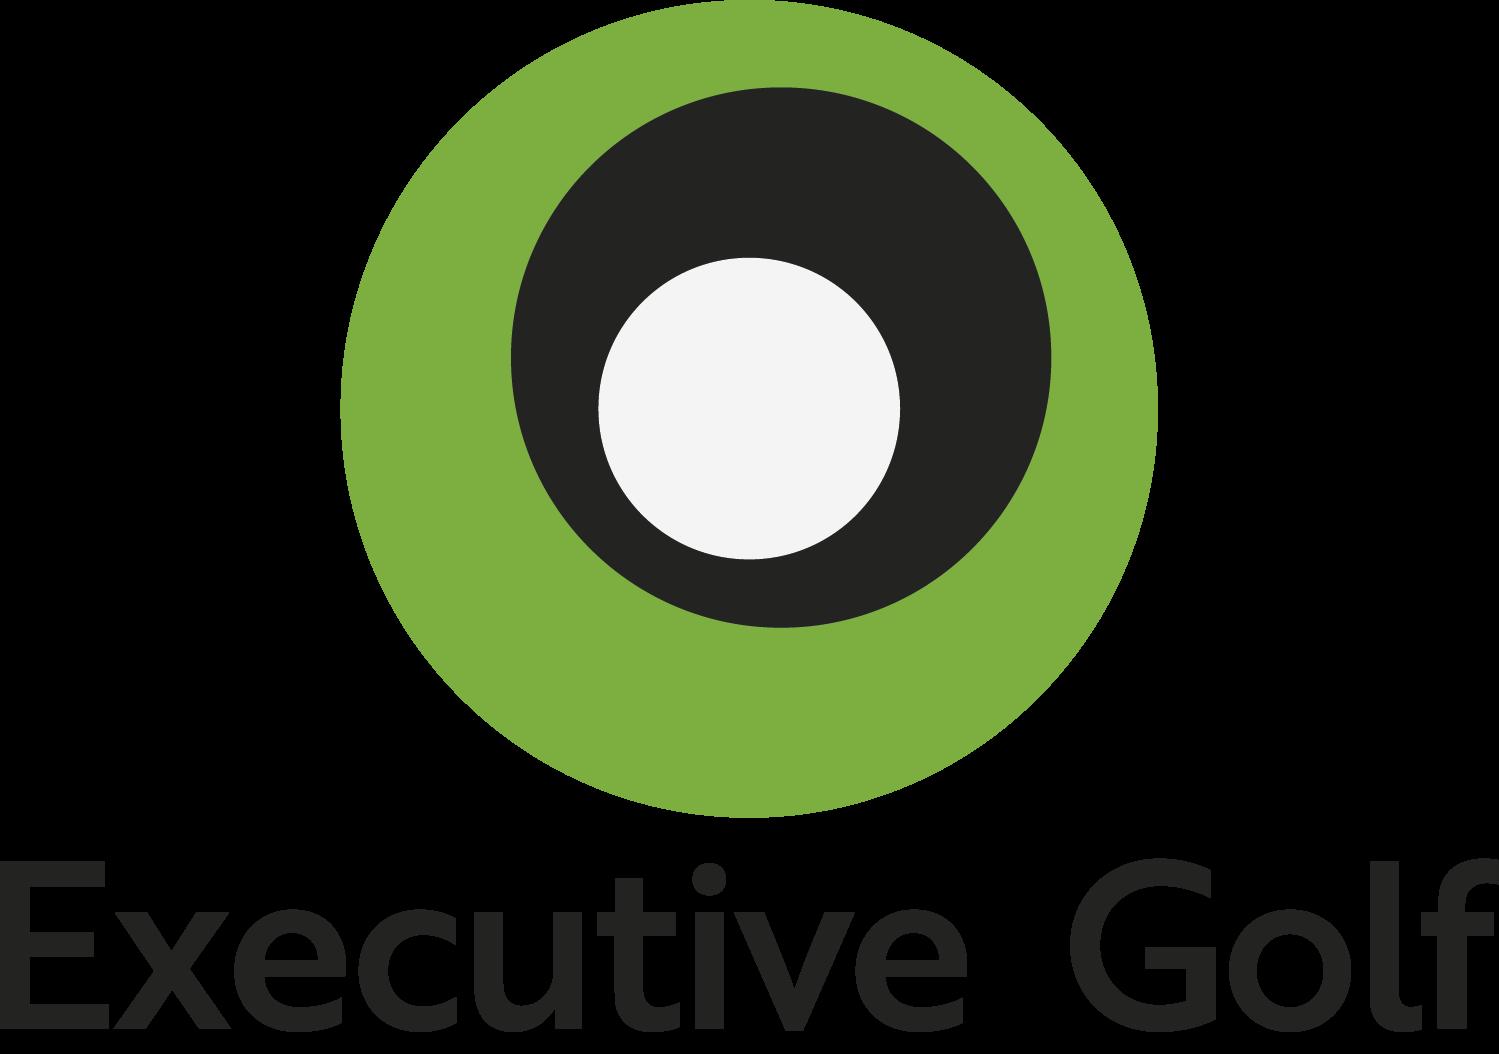 Executive Golf